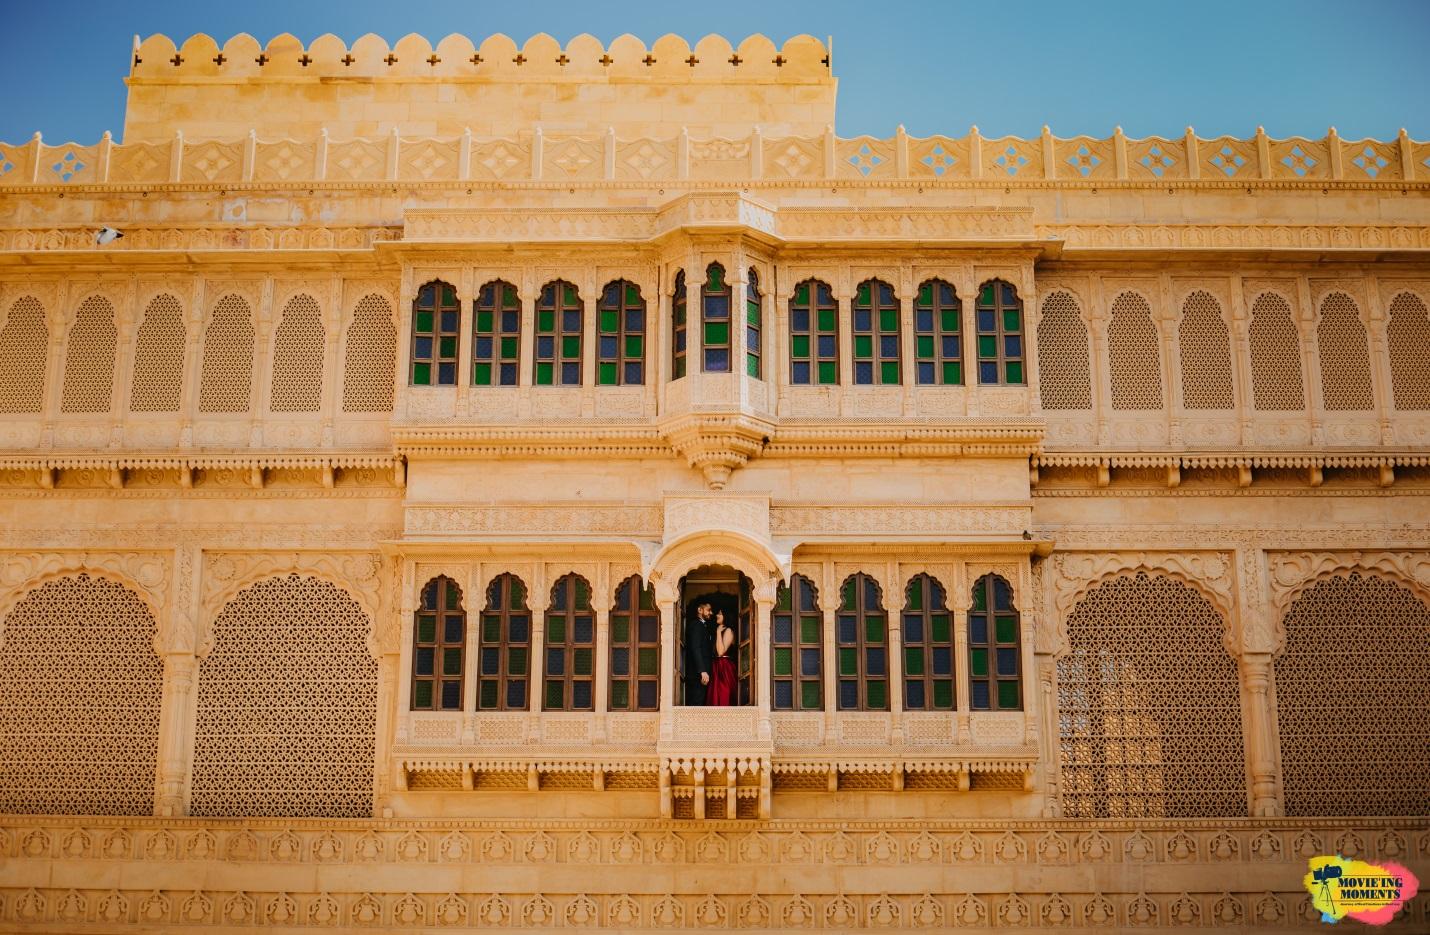 Prewedding shoot ideas in jaisalmer